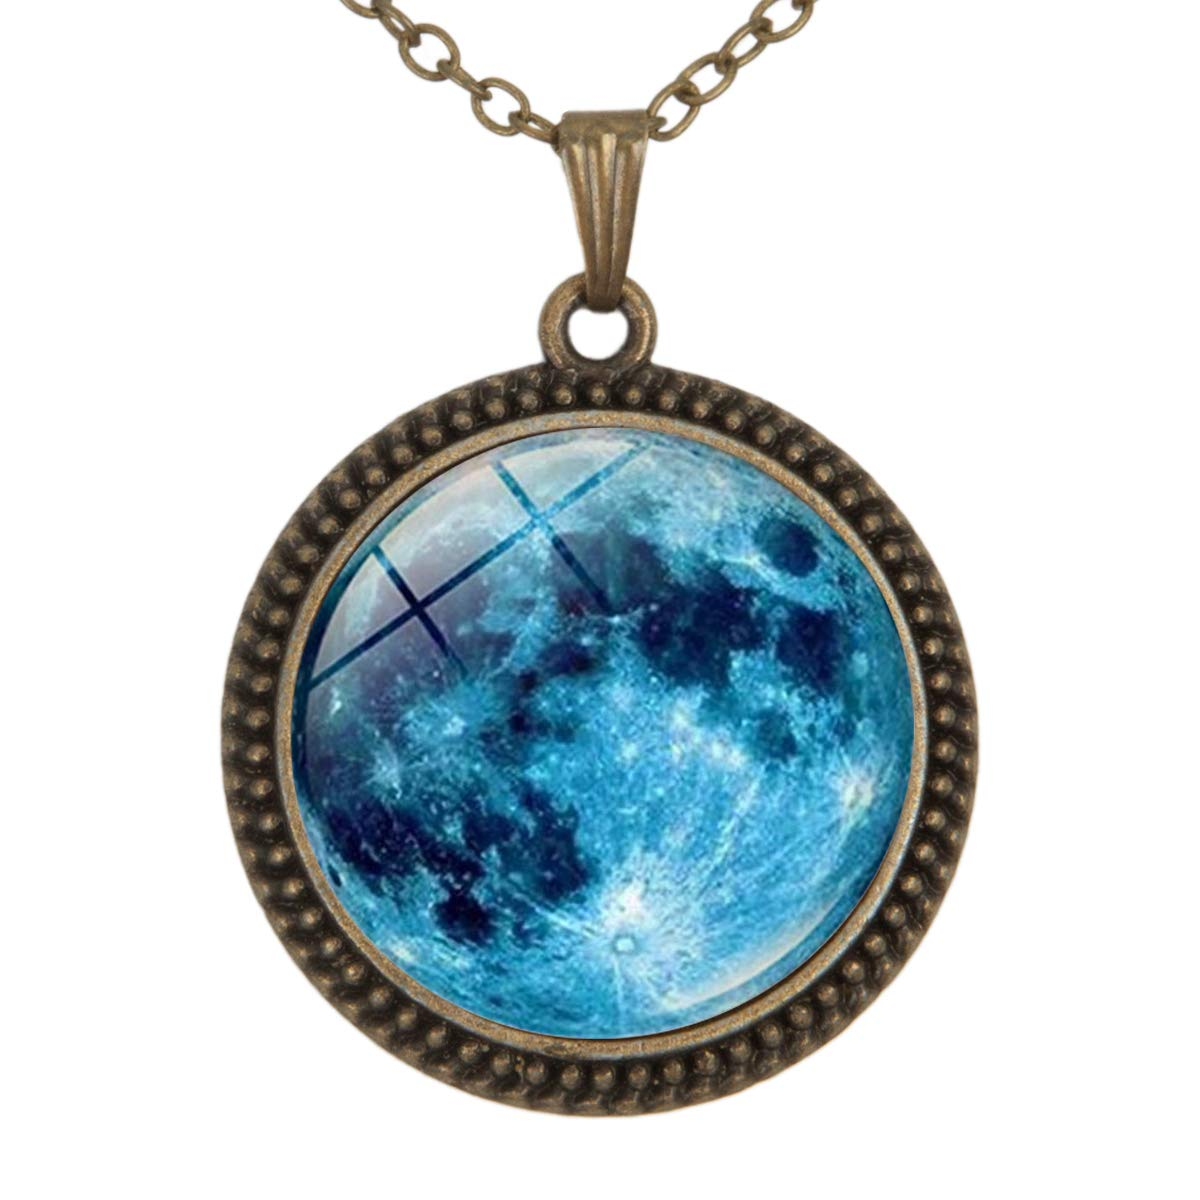 Lightrain Blue Planet Nebula Universe Pendant Necklace Vintage Bronze Chain Statement Necklace Handmade Jewelry Gifts